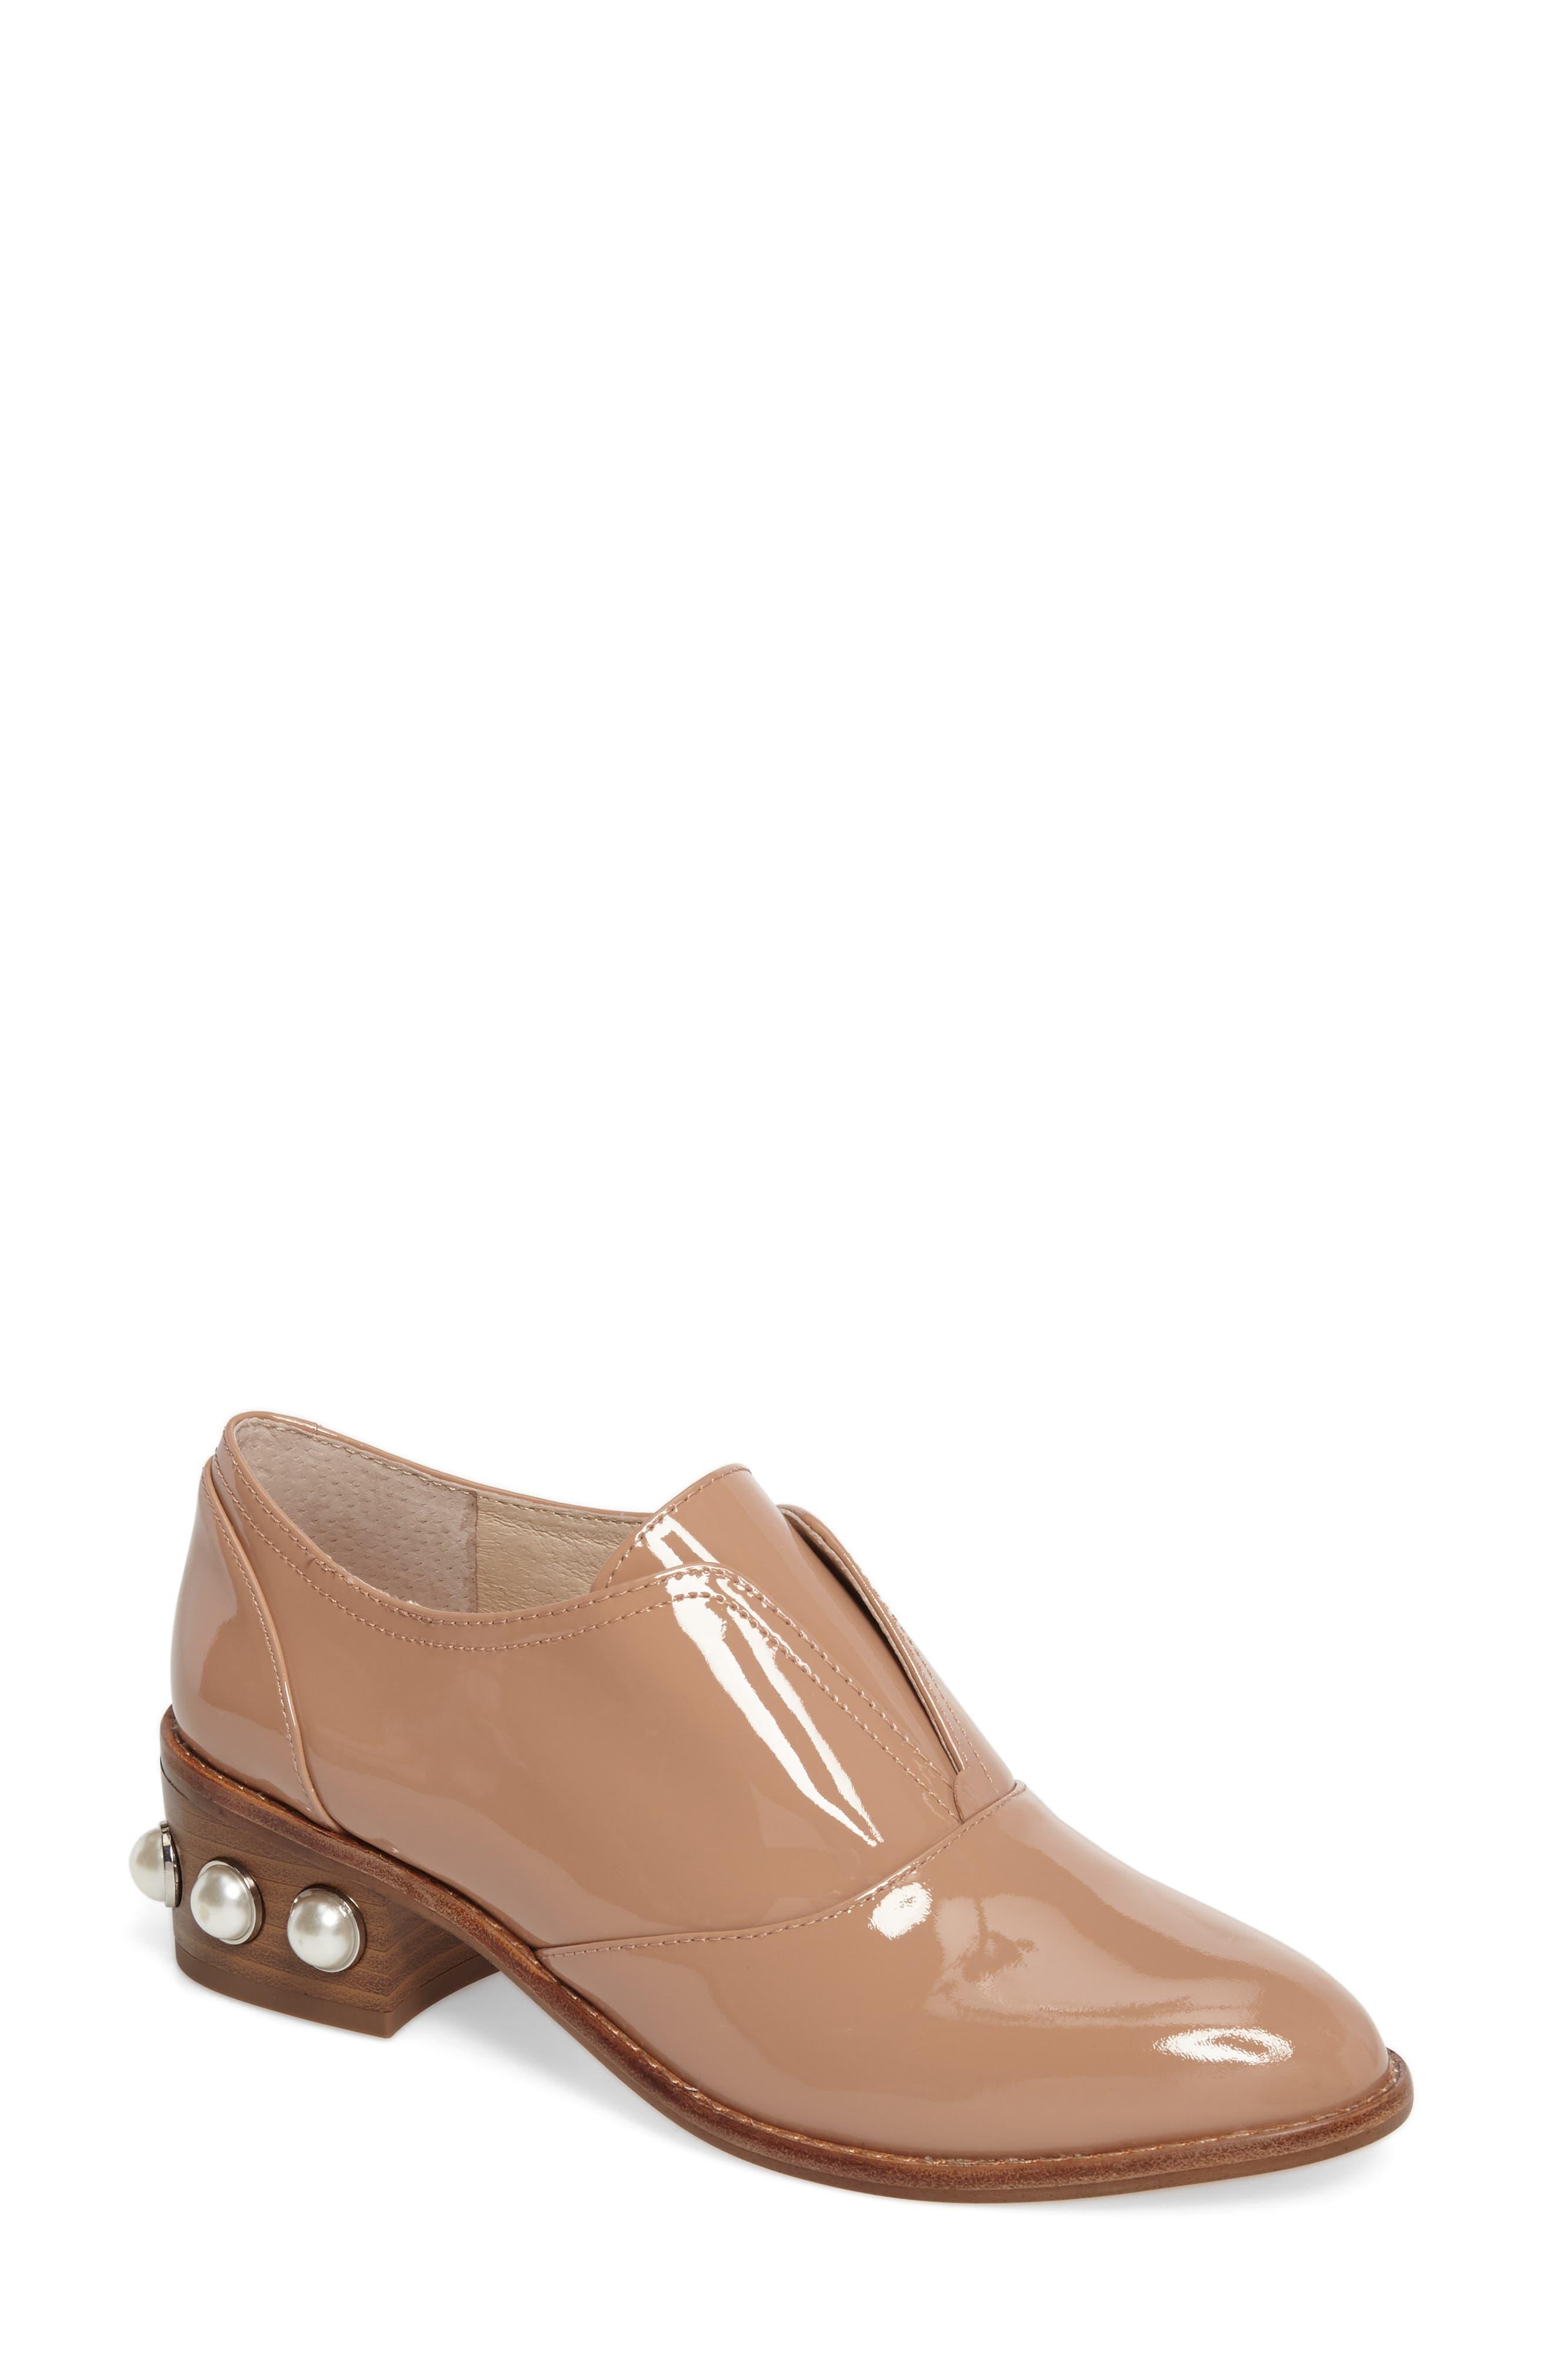 Main Image - Louise et Cie Franley Embellished Heel Oxford (Women)